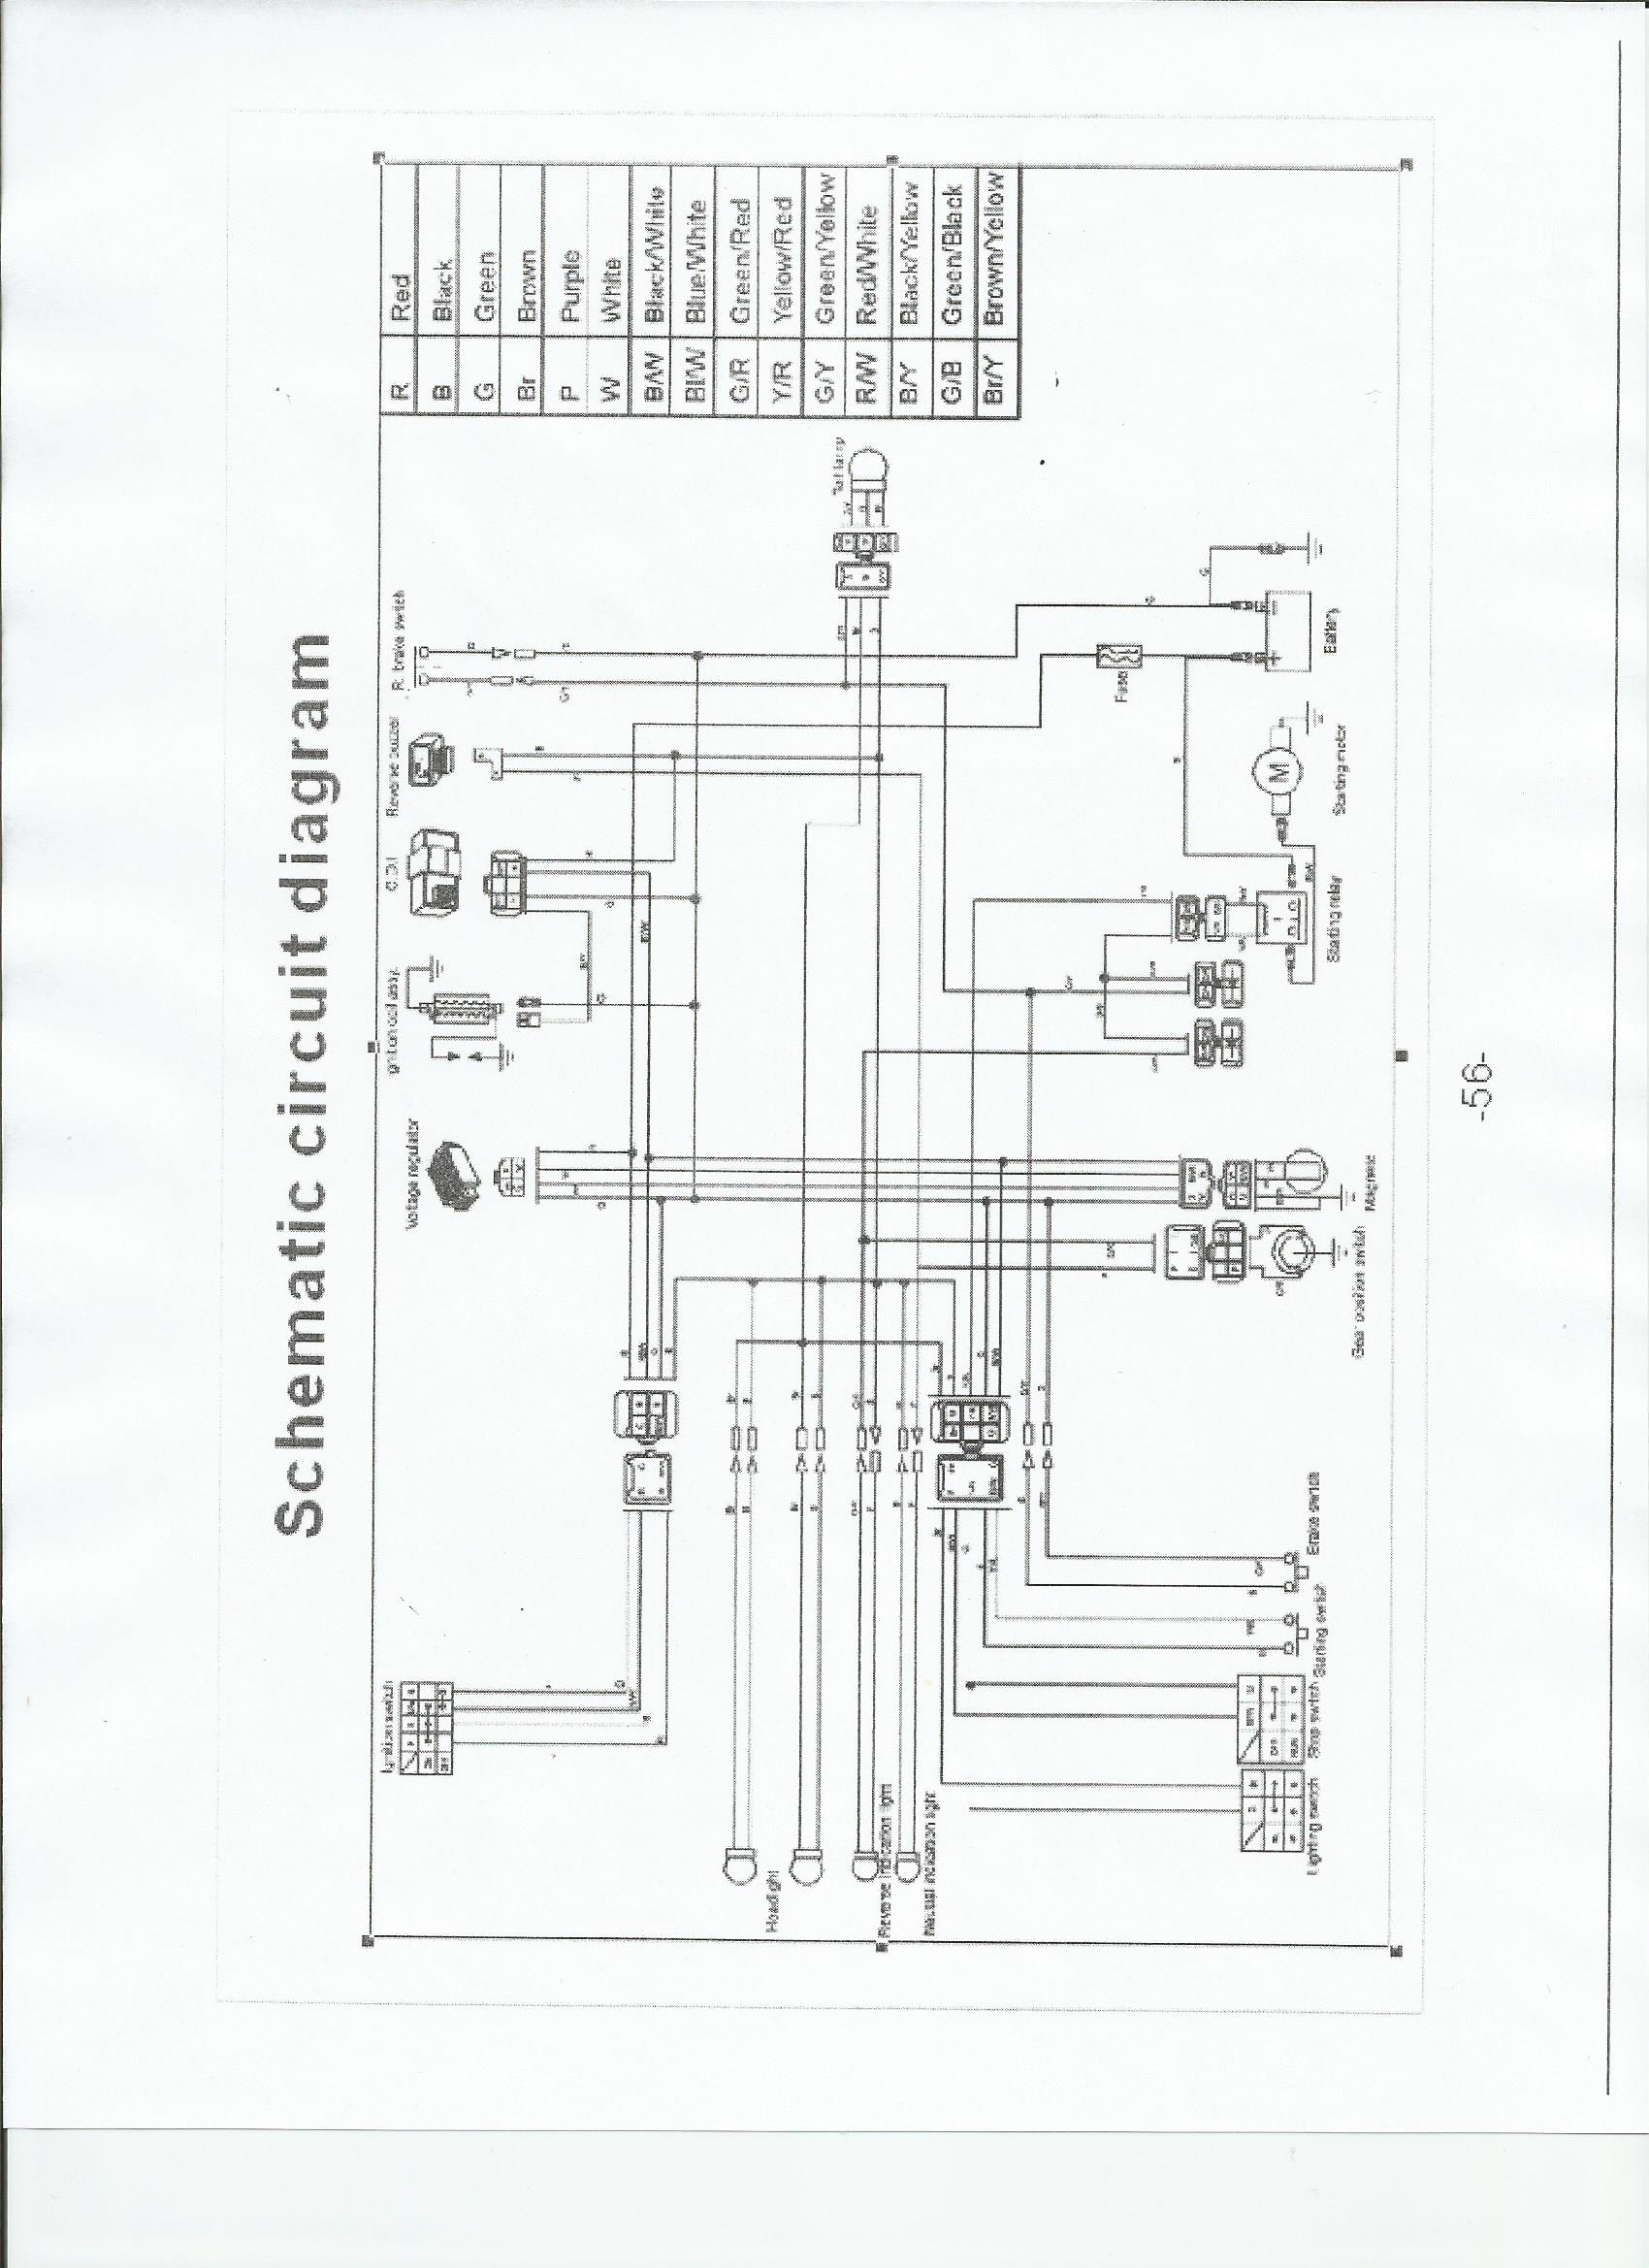 small resolution of 107 atv wiring harness wiring diagram show 107 atv wiring harness